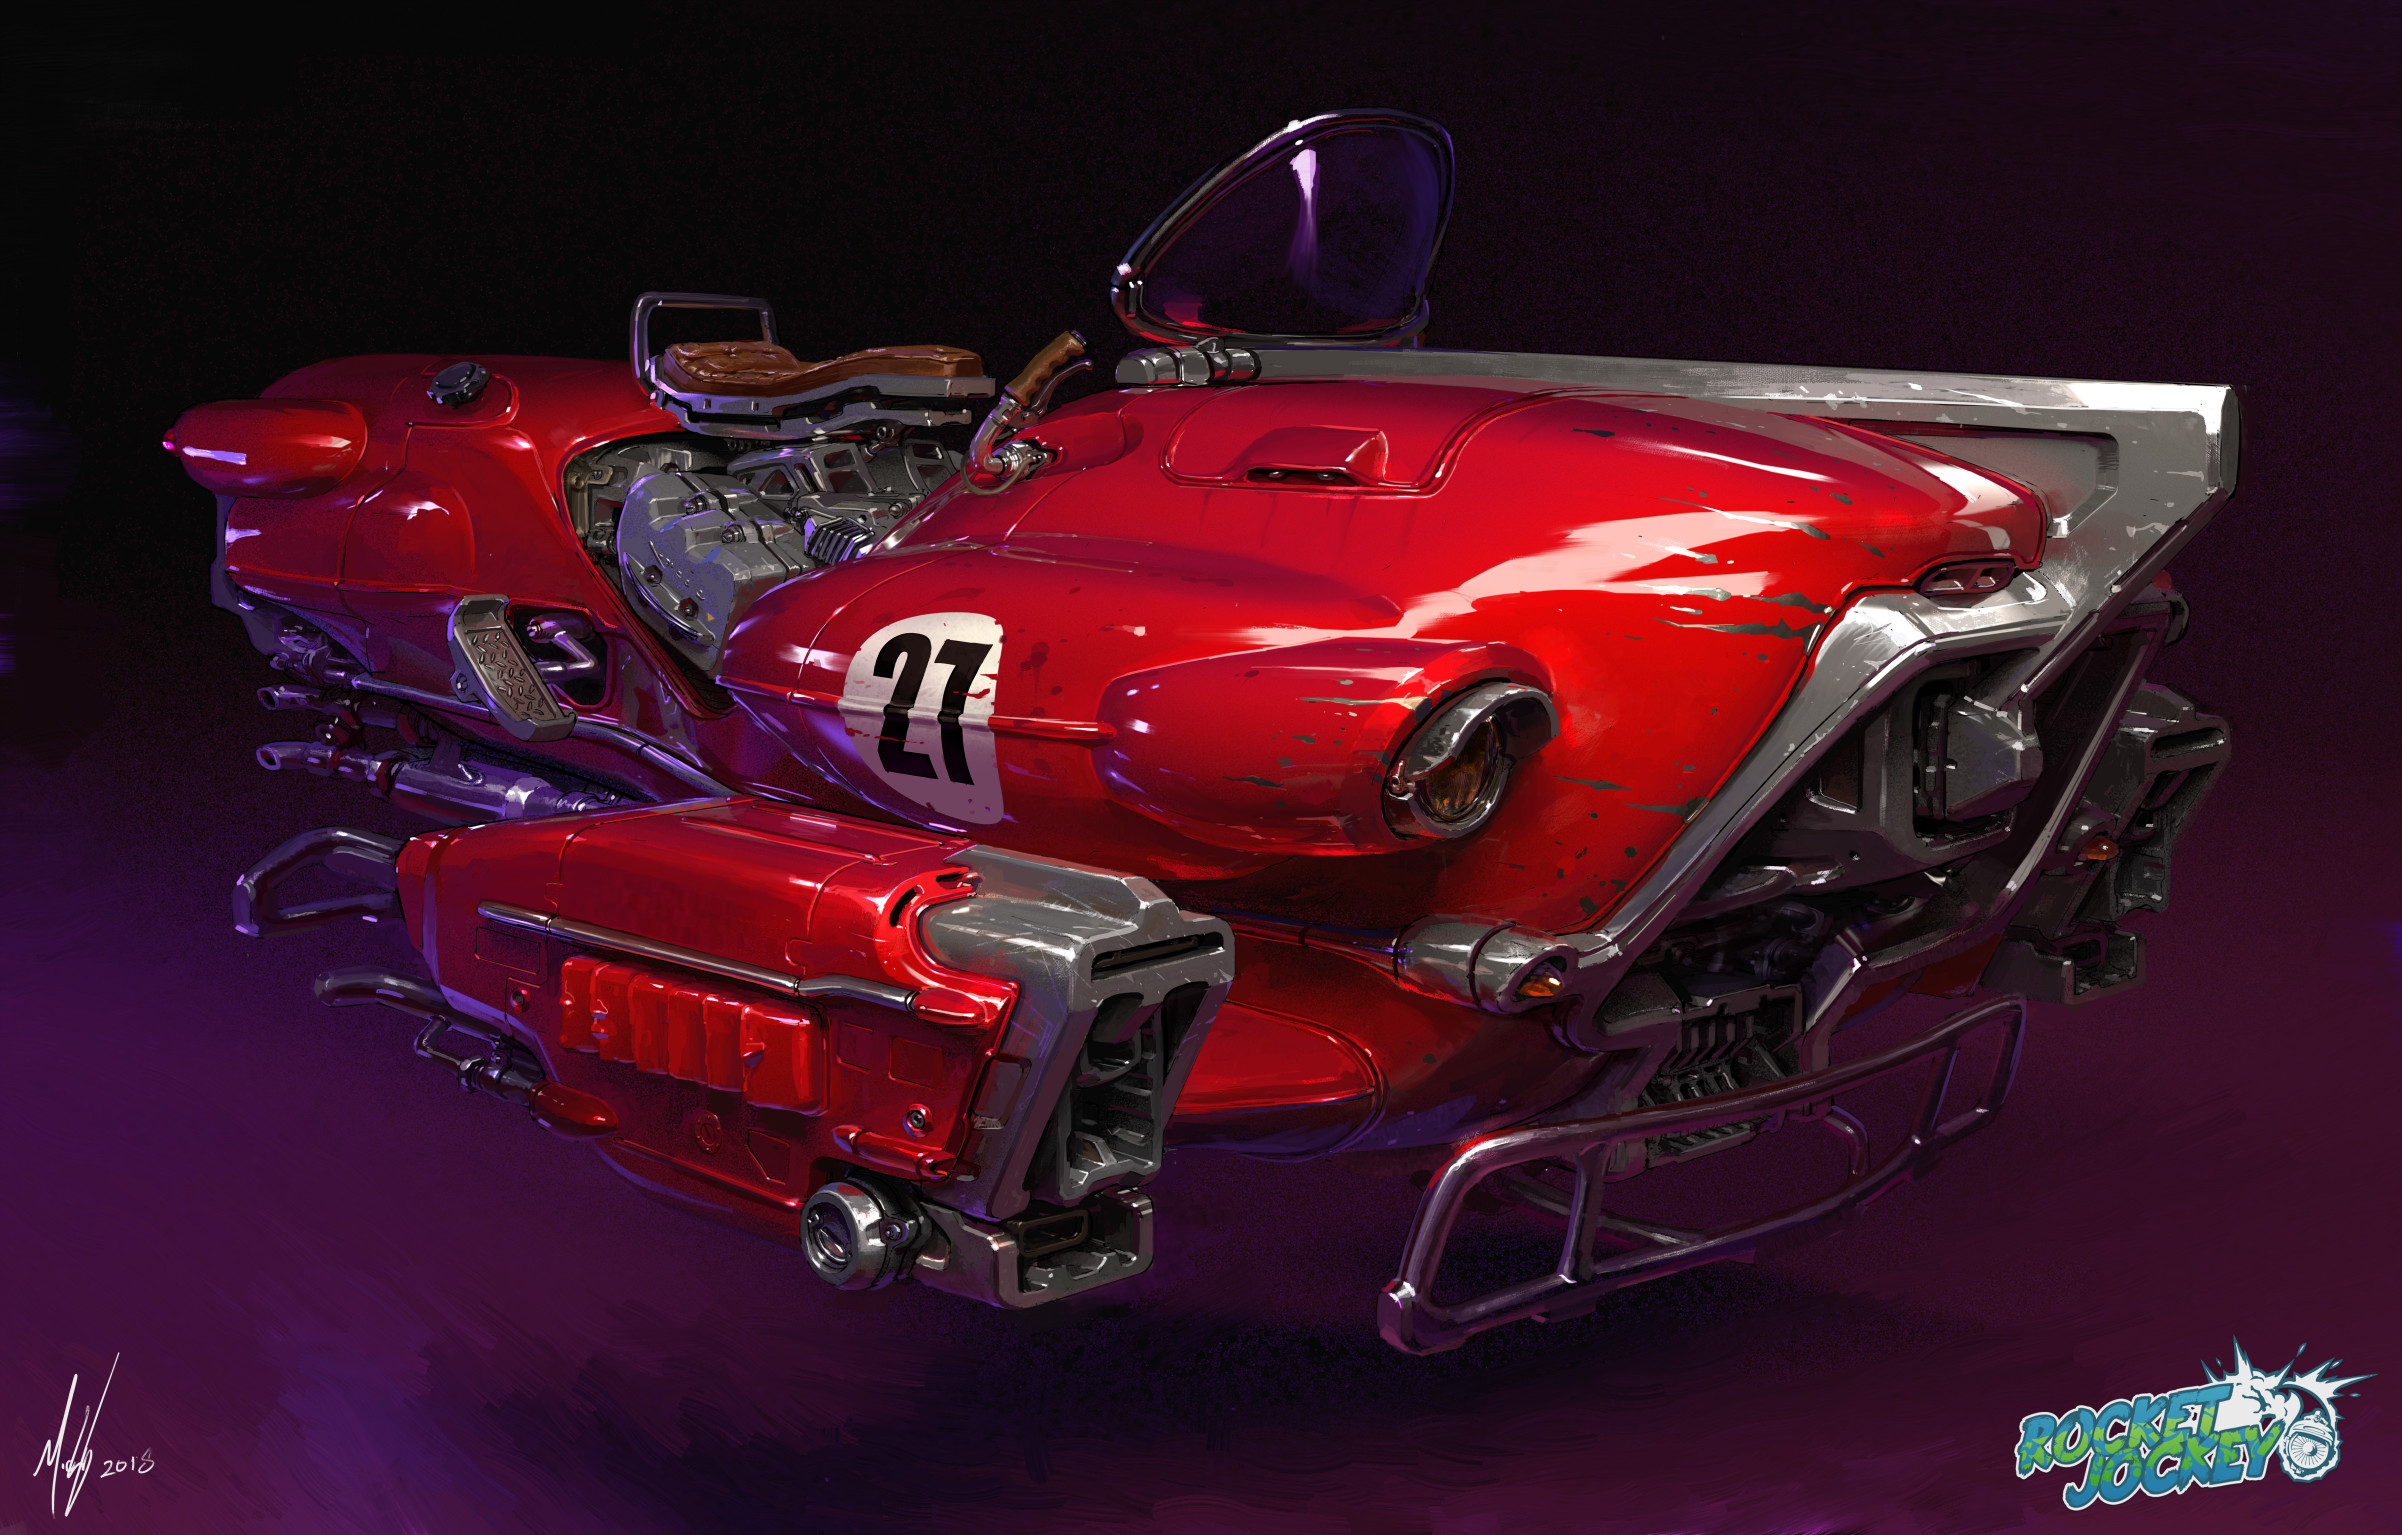 Flying Car Futuristic Digital Art Digital Painting Fan Art Artwork 2402x1535